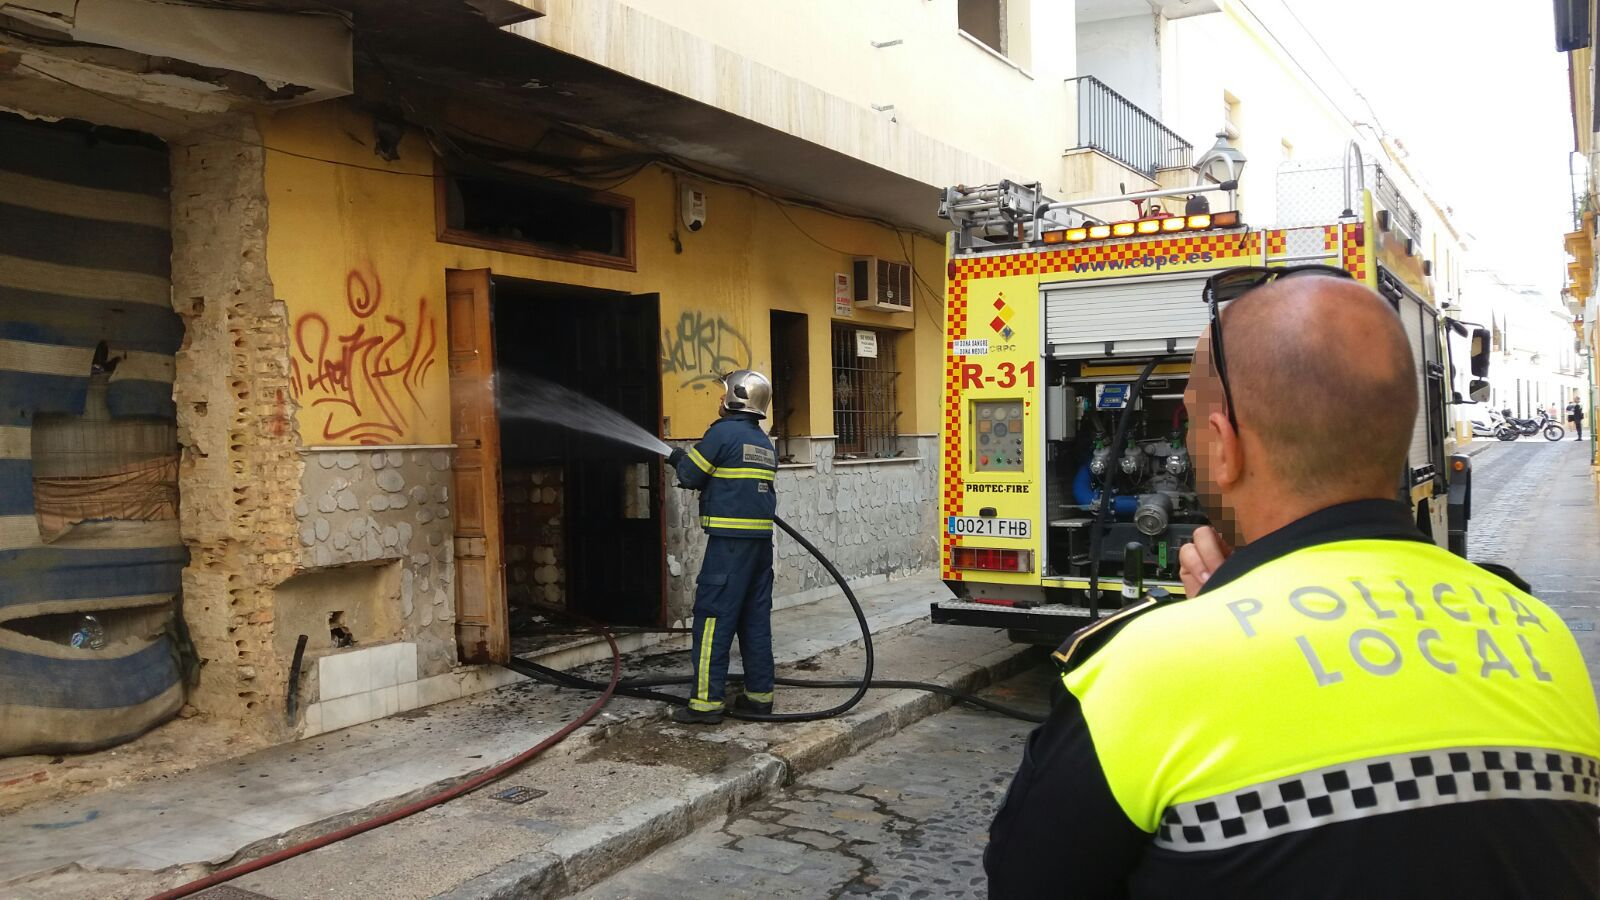 Incendio en calle Gaspar Fernández, Jerez. MAYO 2016   MIRA Comunicación